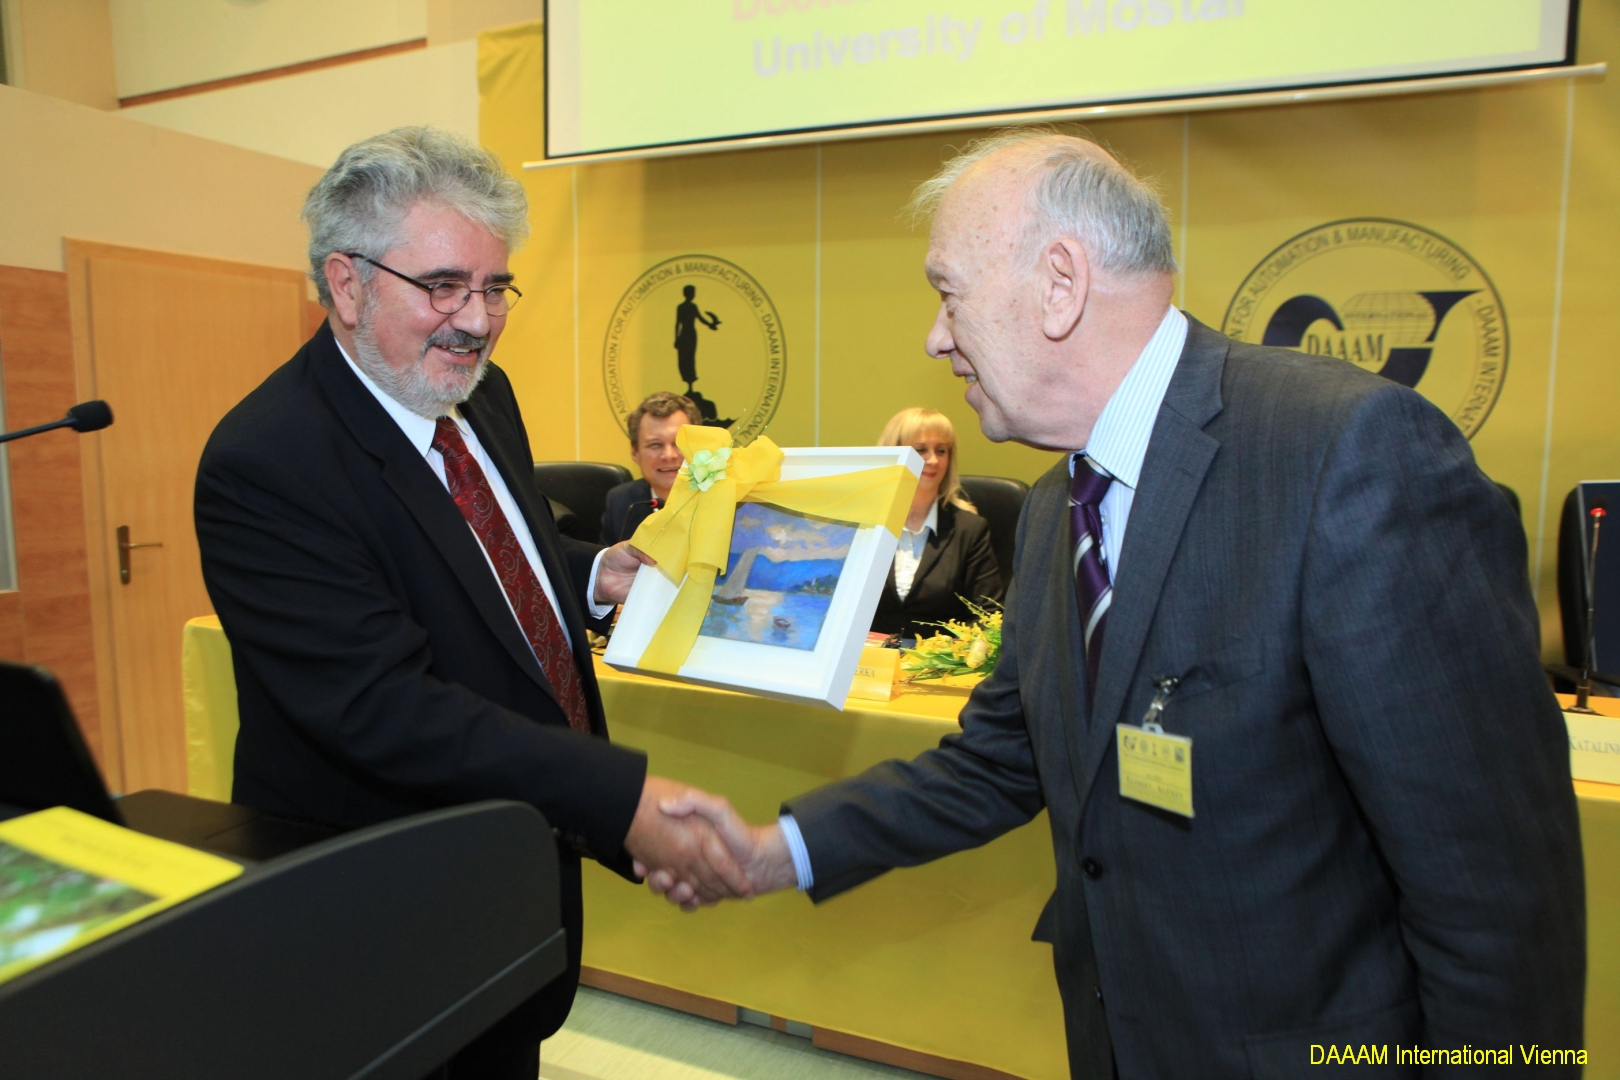 DAAAM_2016_Mostar_06_Professor_and_Cosmonaut_Alexey_Eliseev_Doctor_honors_causa_024